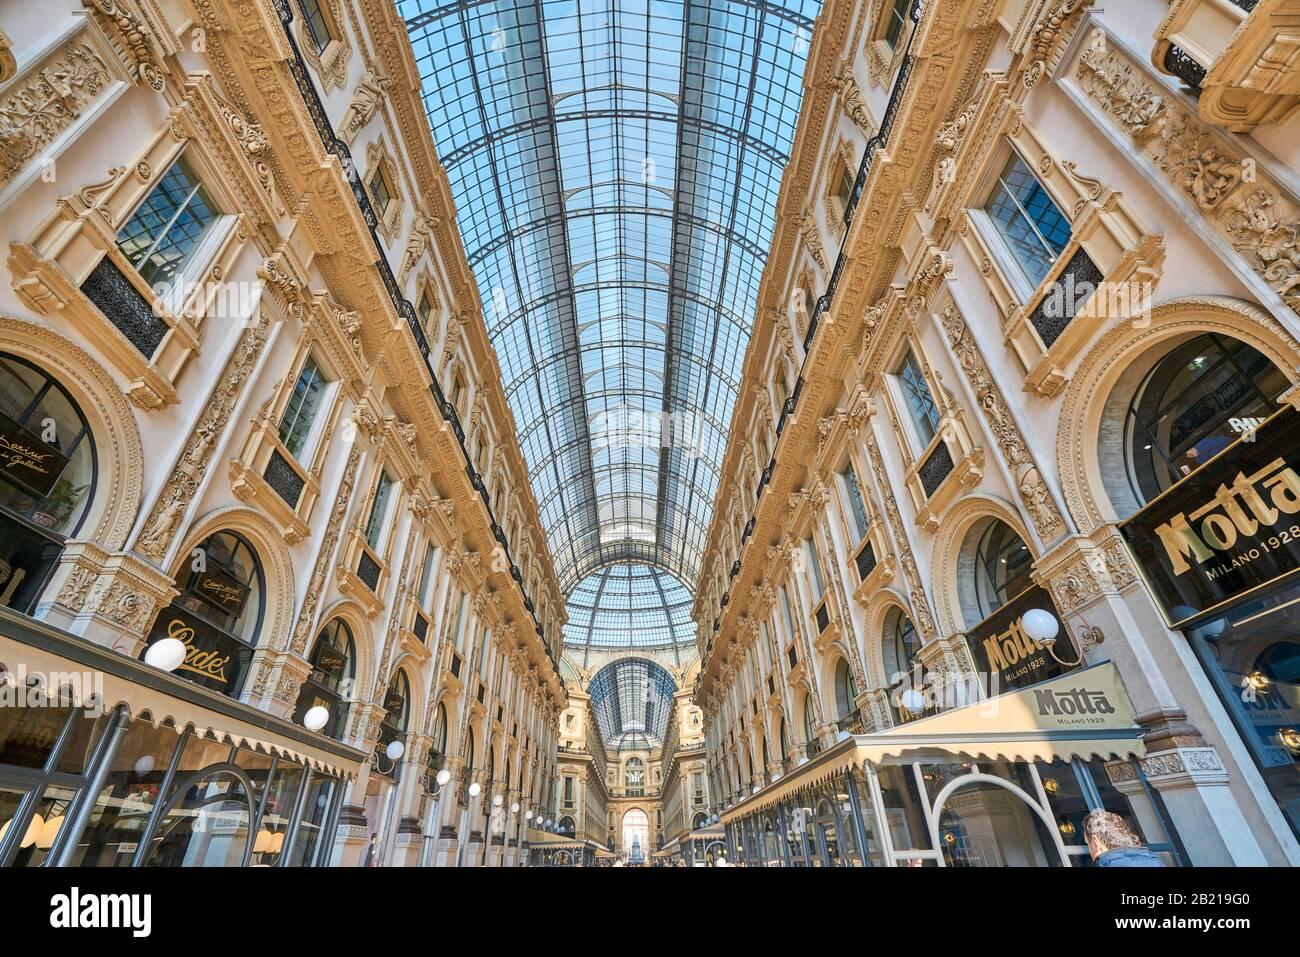 Milan, Italy - January 21 2019: Shopping art gallery in Milan. Galleria Vittorio Emanuele II, Italy Stock Photo